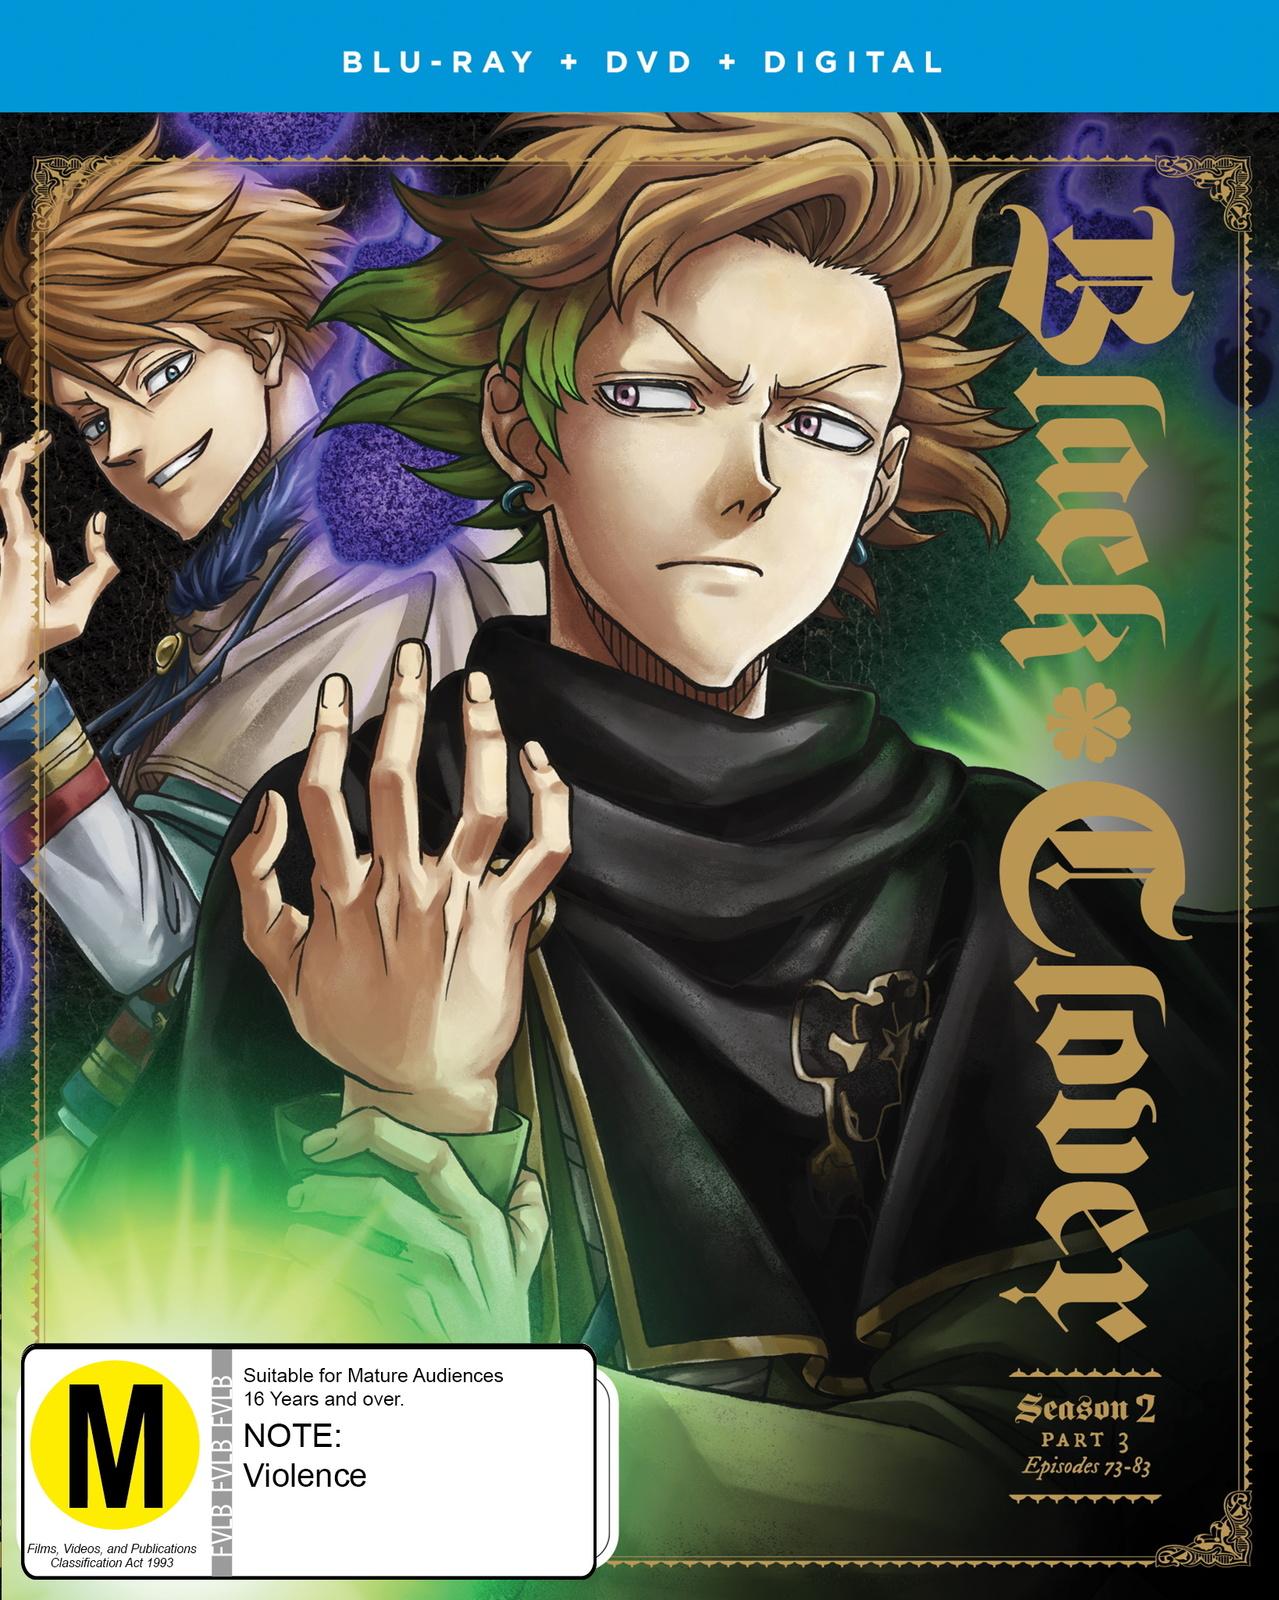 Black Clover - Season 2: Part 3 DVD / Blu-ray Combo on DVD, Blu-ray image